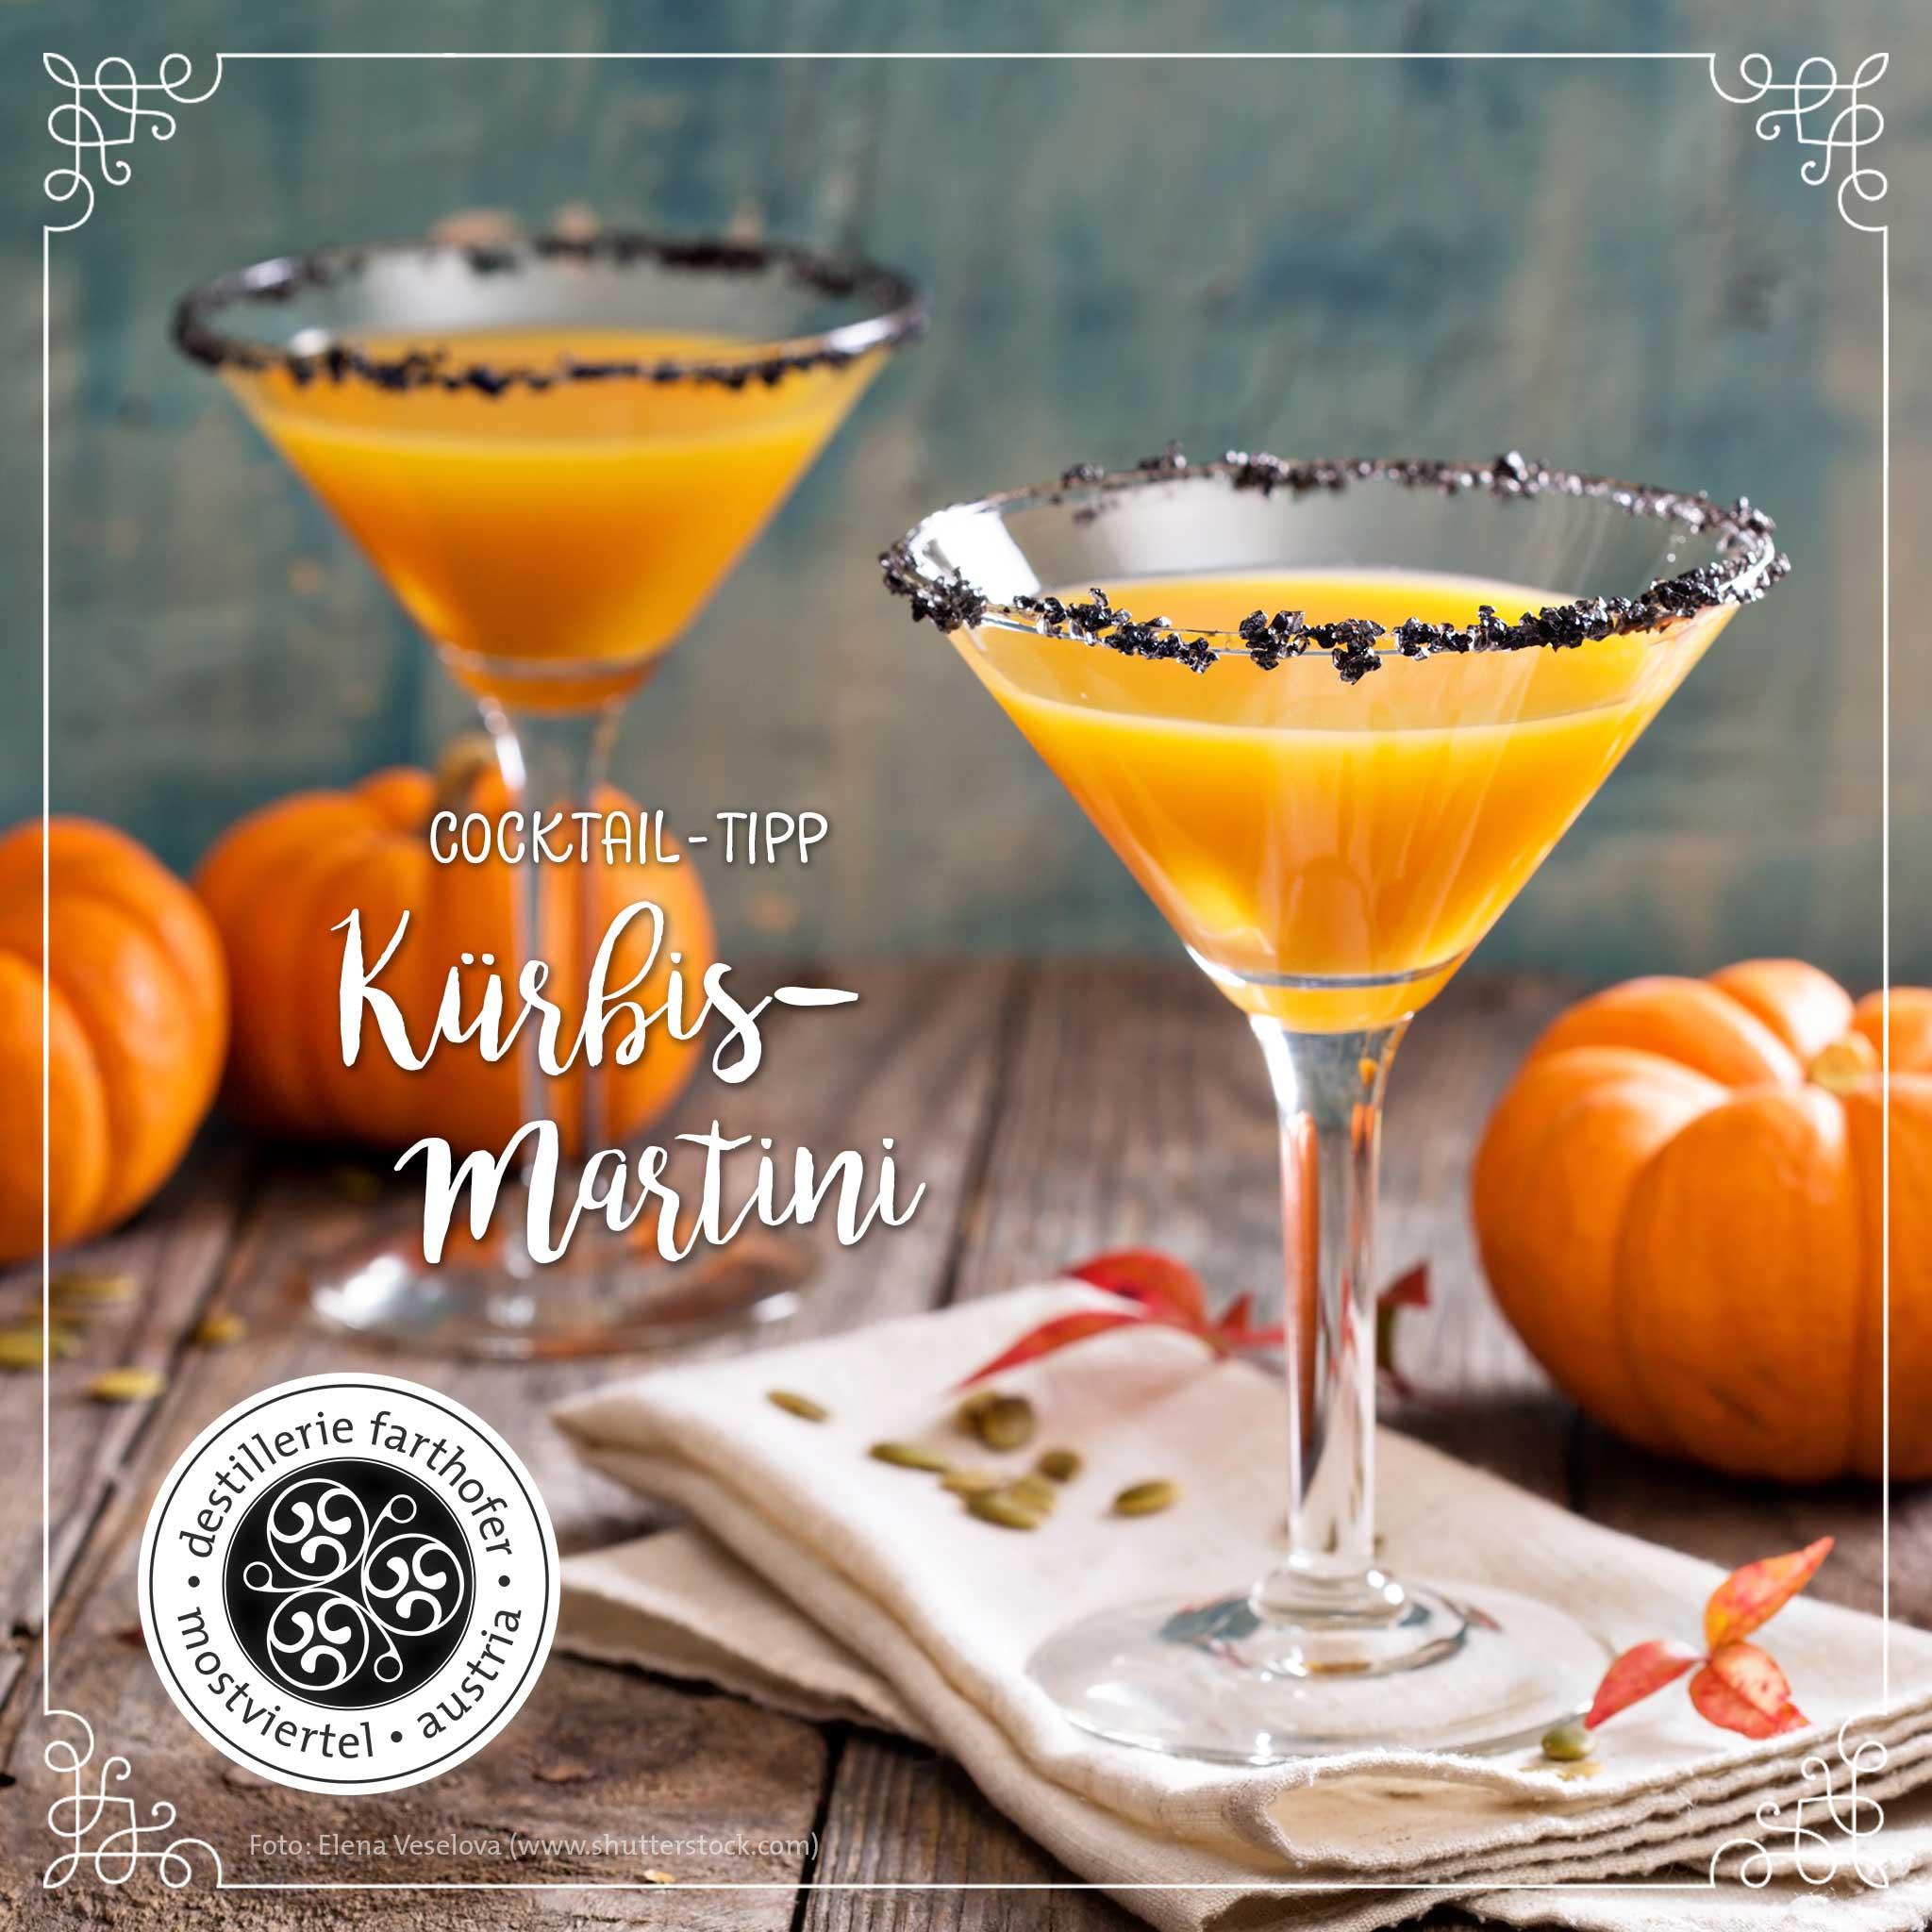 Cocktail-Tipp: Kürbis-Martini - Destillerie Farthofer